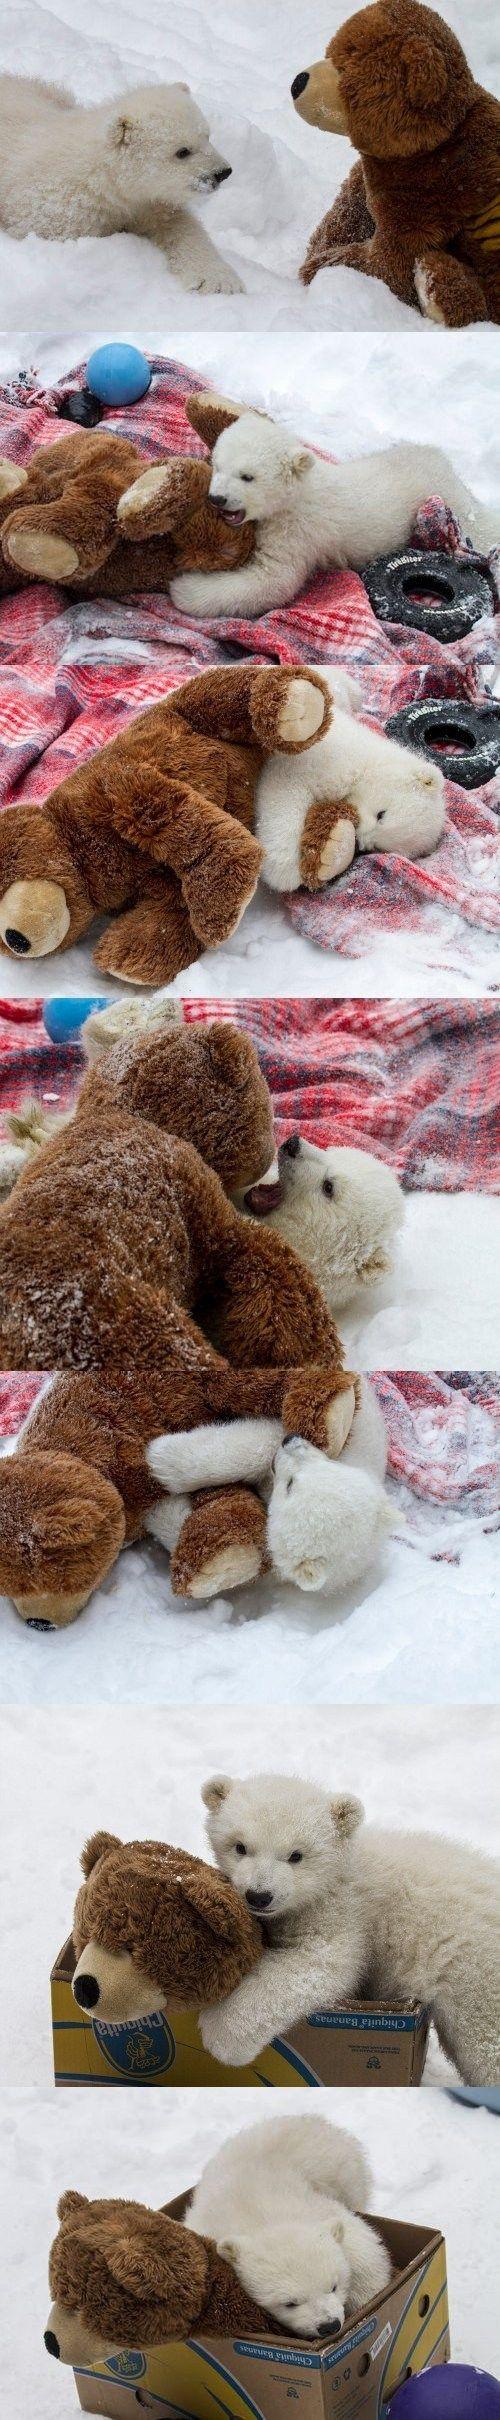 baby polar bear meets a friend.